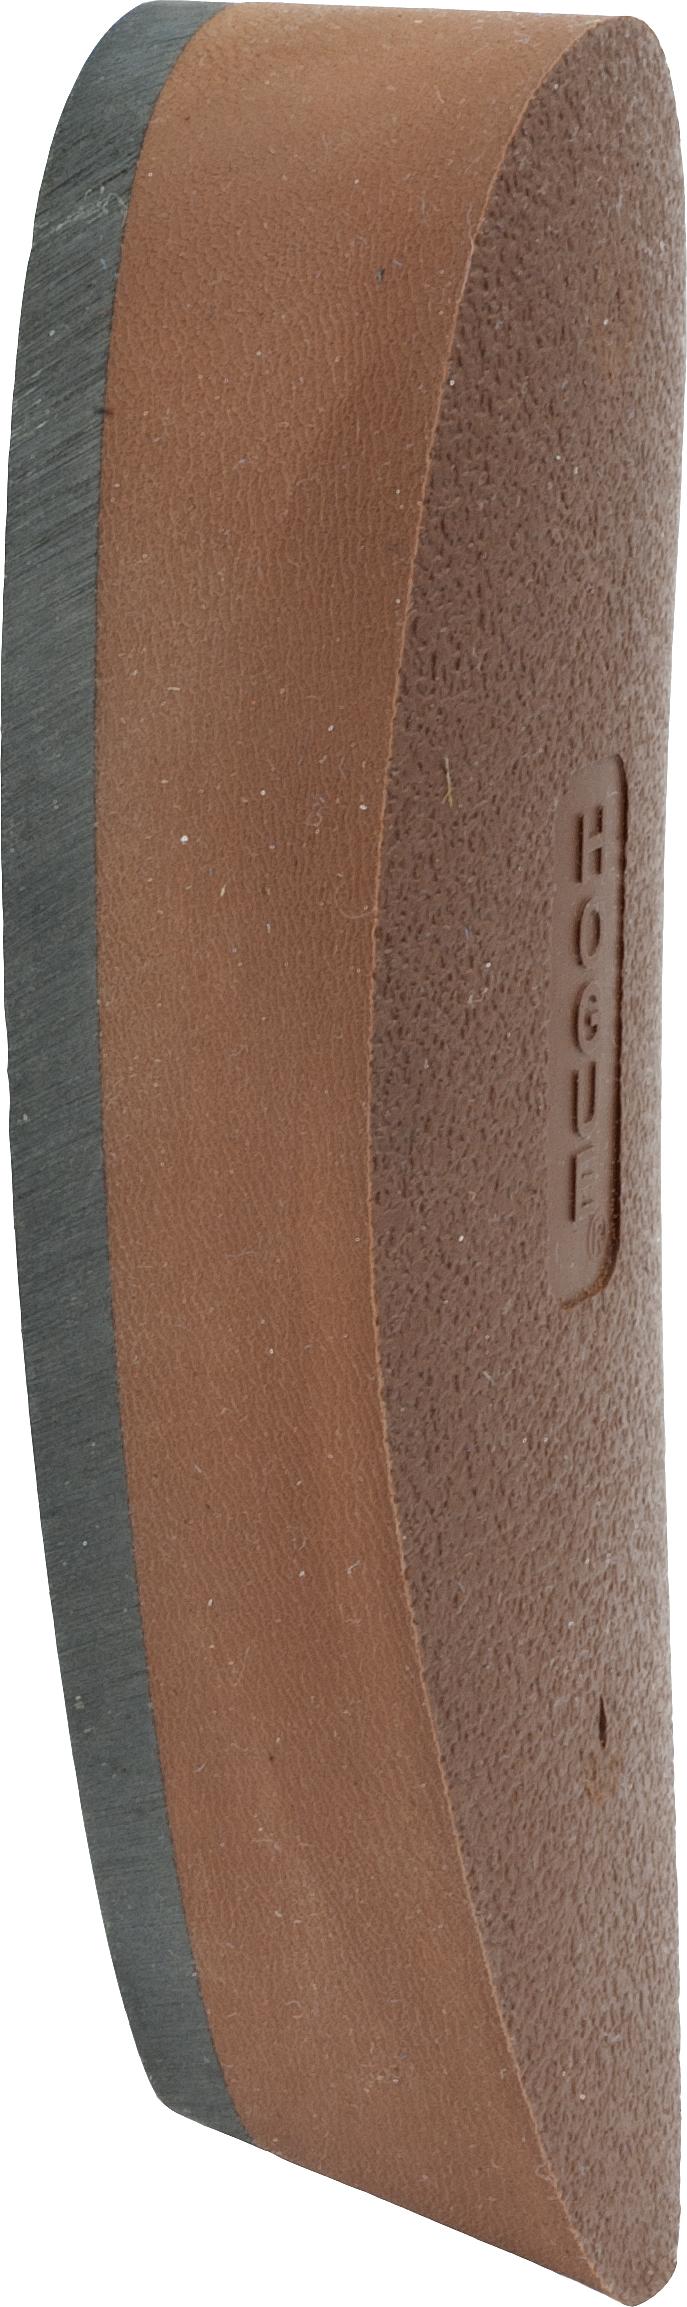 b3e71df0dbe25 Hogue EZG Pre-sized recoil pad Rem. 870/11-87/1100 wood Stk. -Brown 70731